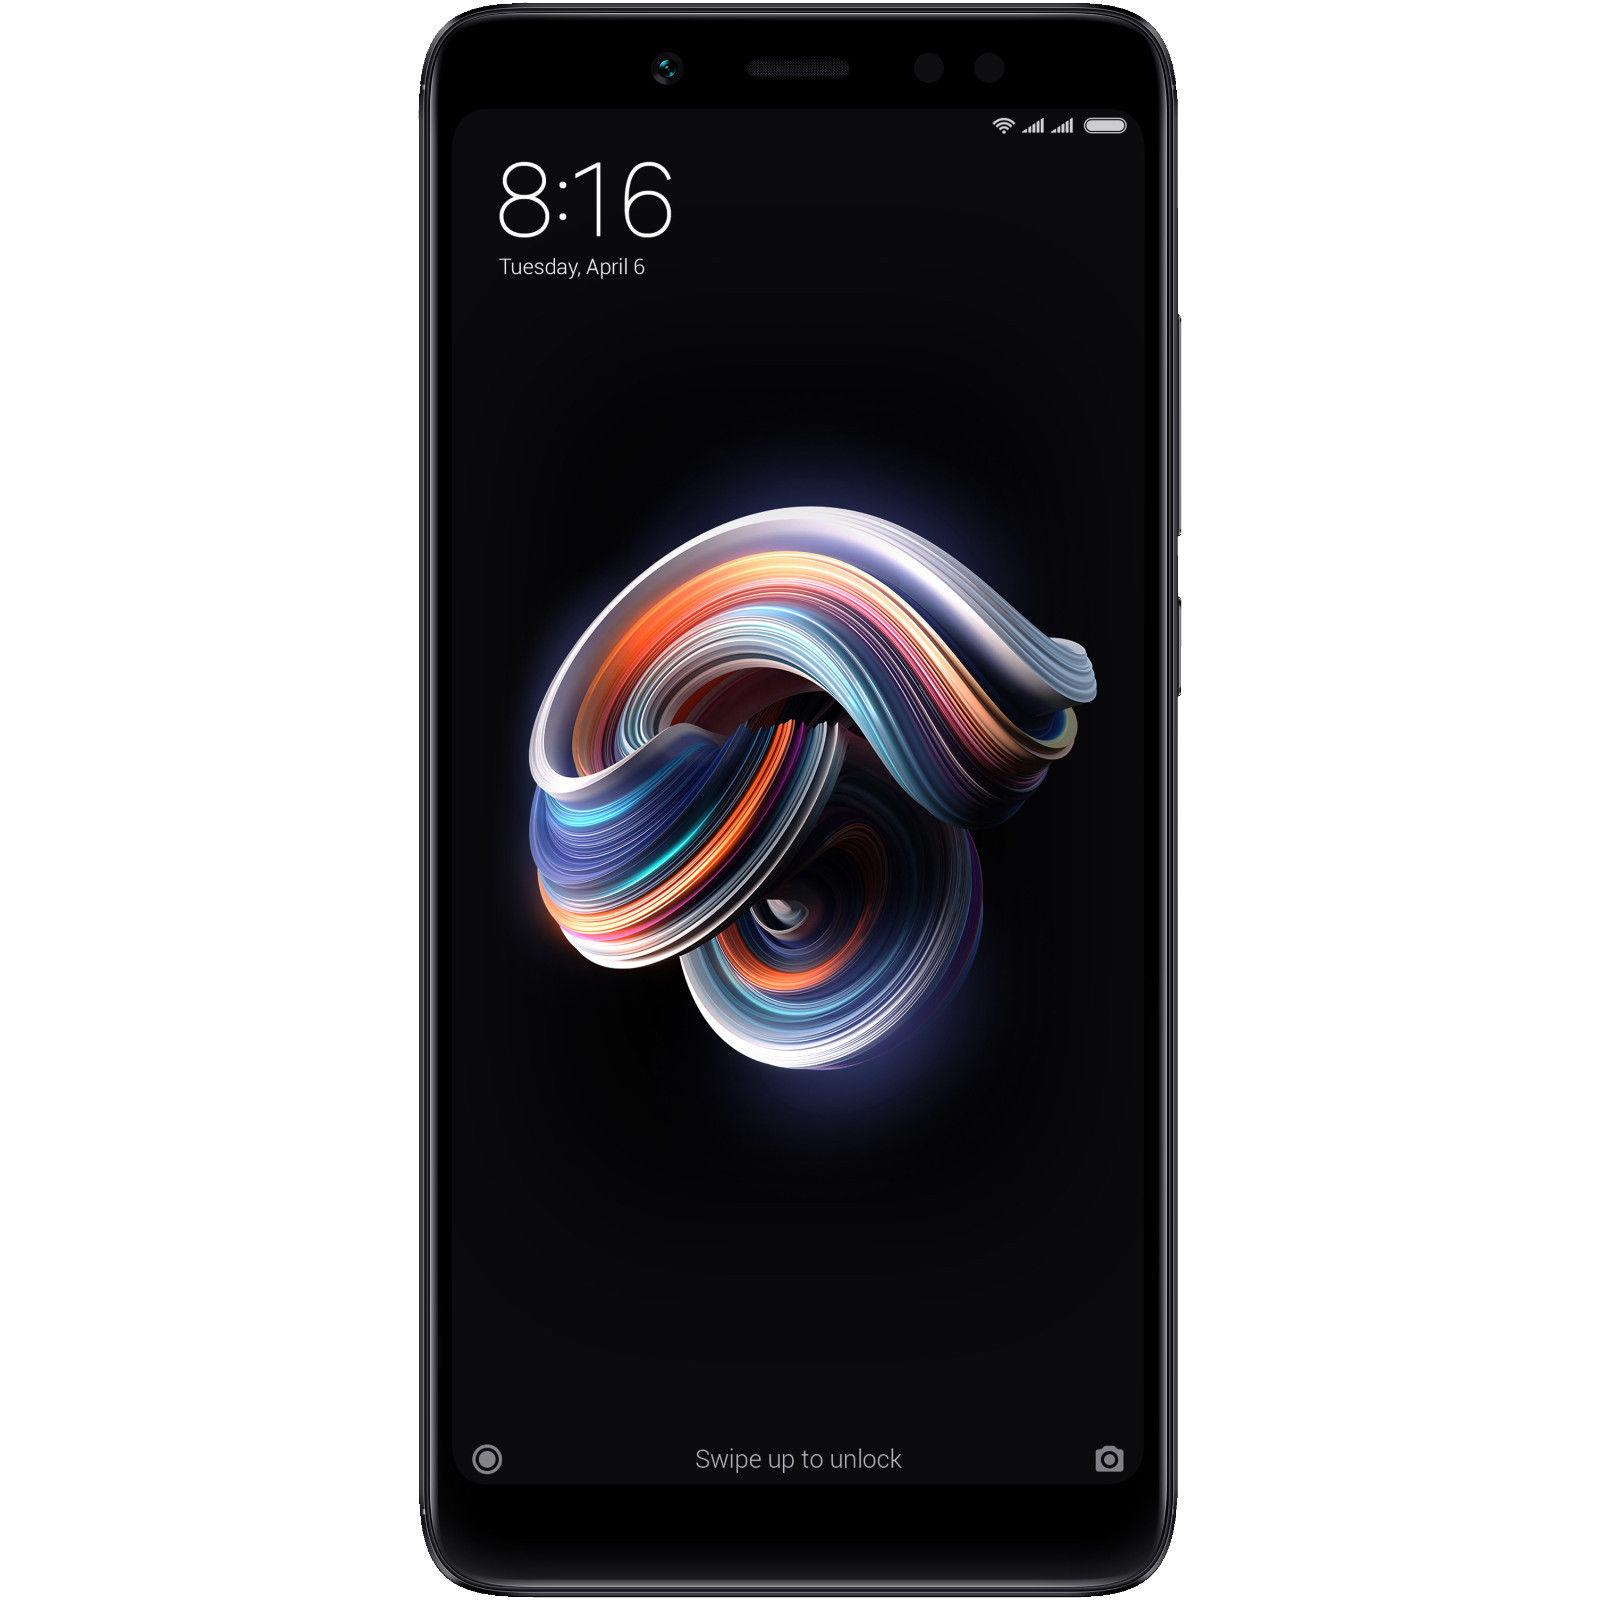 Xiaomi Redmi Note 5 4GB 64GB Snapdragon 636 Smartphone Global Band 20 [Saturn/Ebay/Amazon]